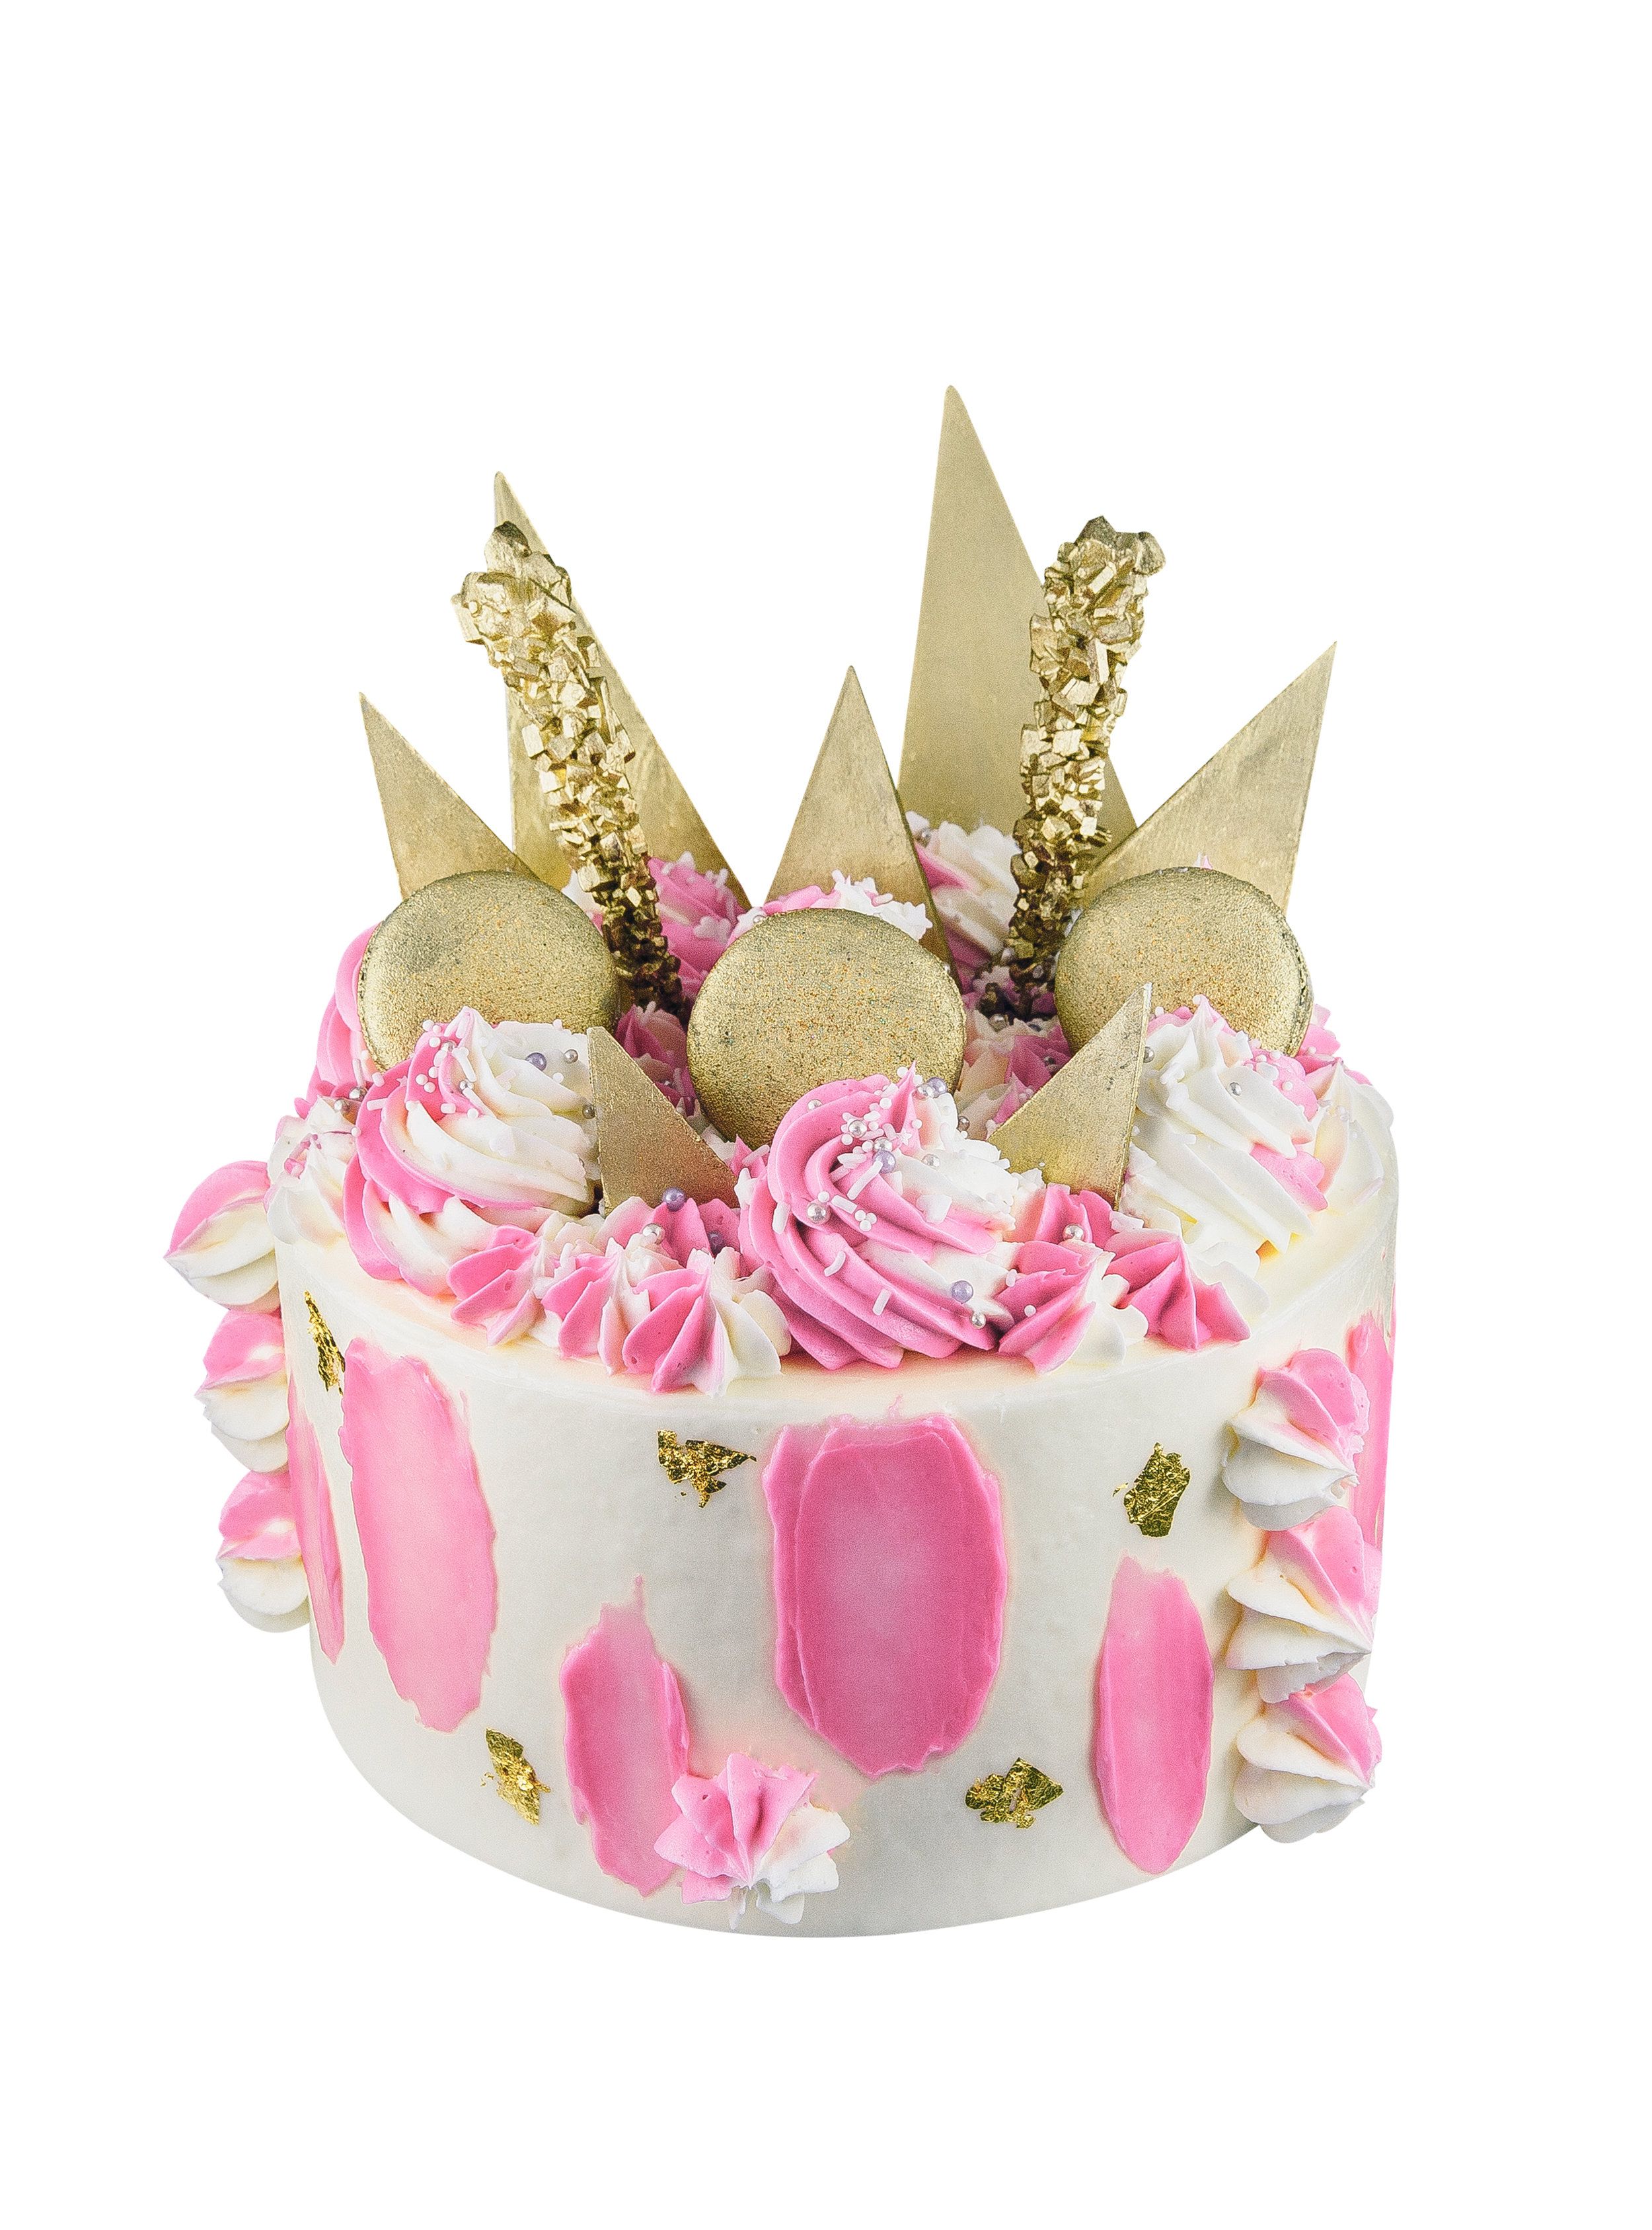 PINK WONDERLAND CAKE -